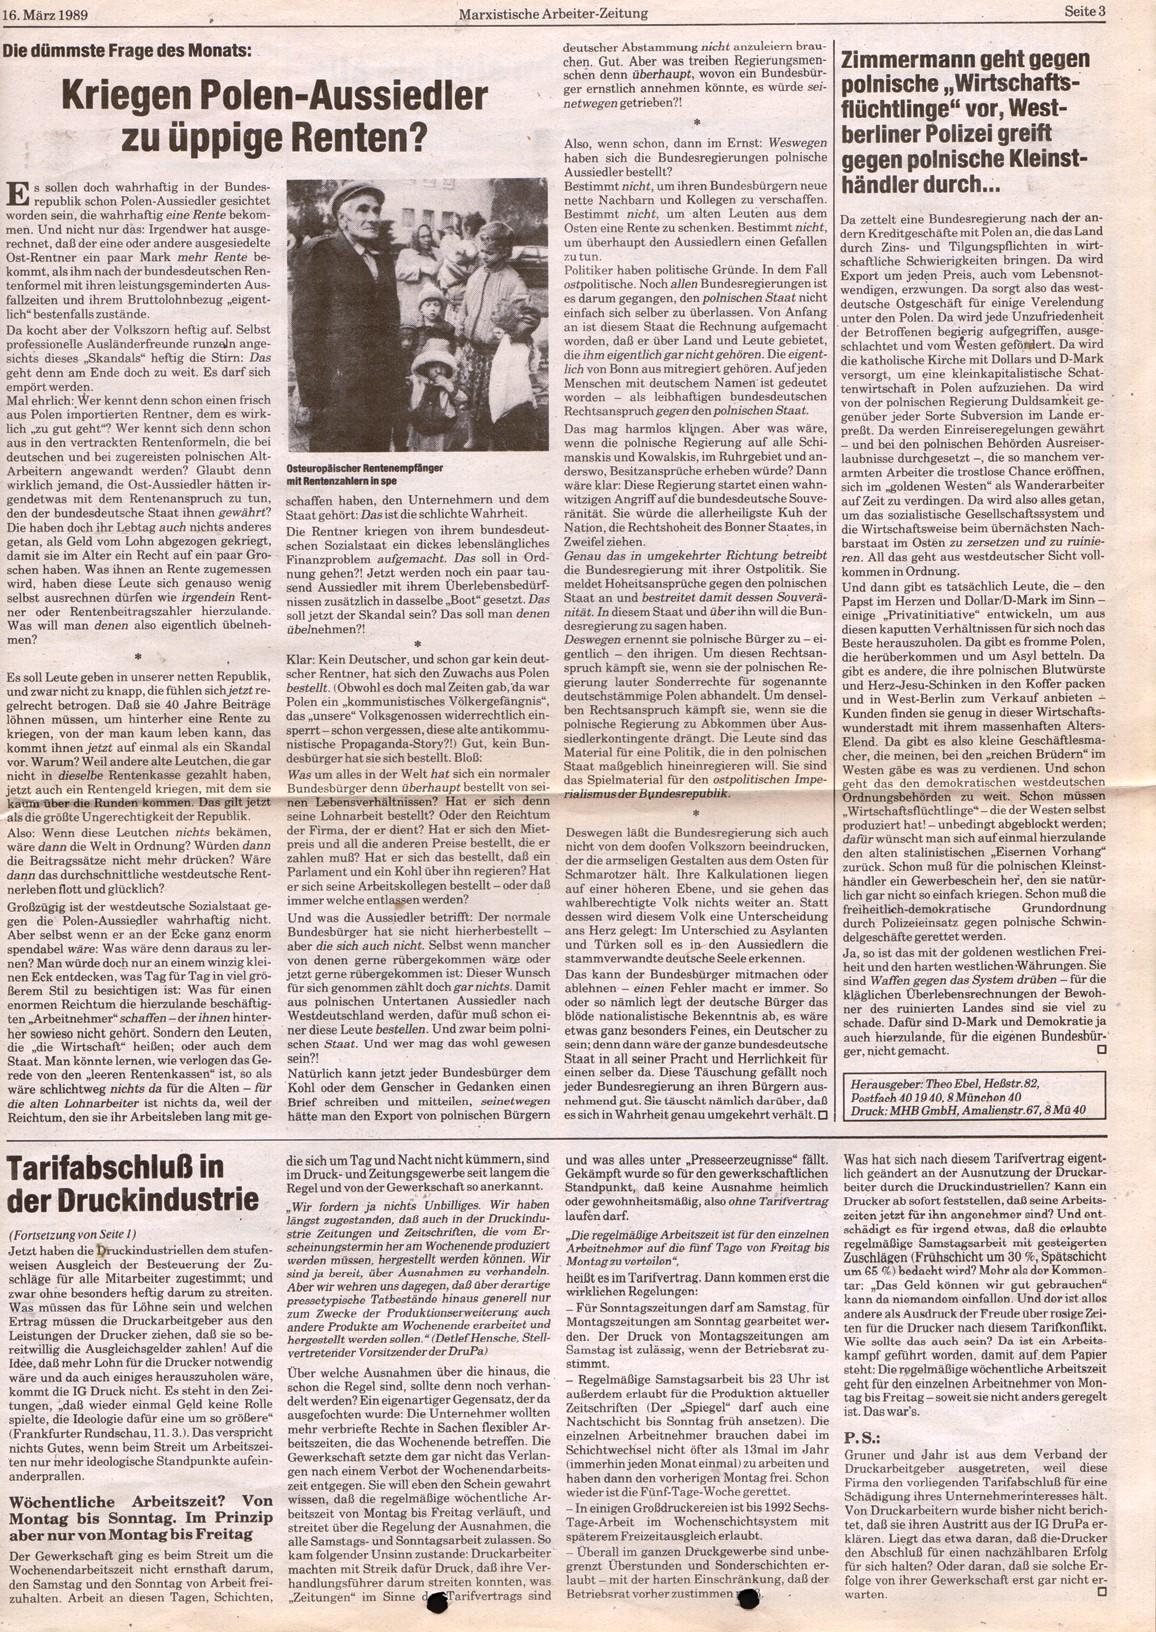 Muenchen_MG_MAZ_19890316_03